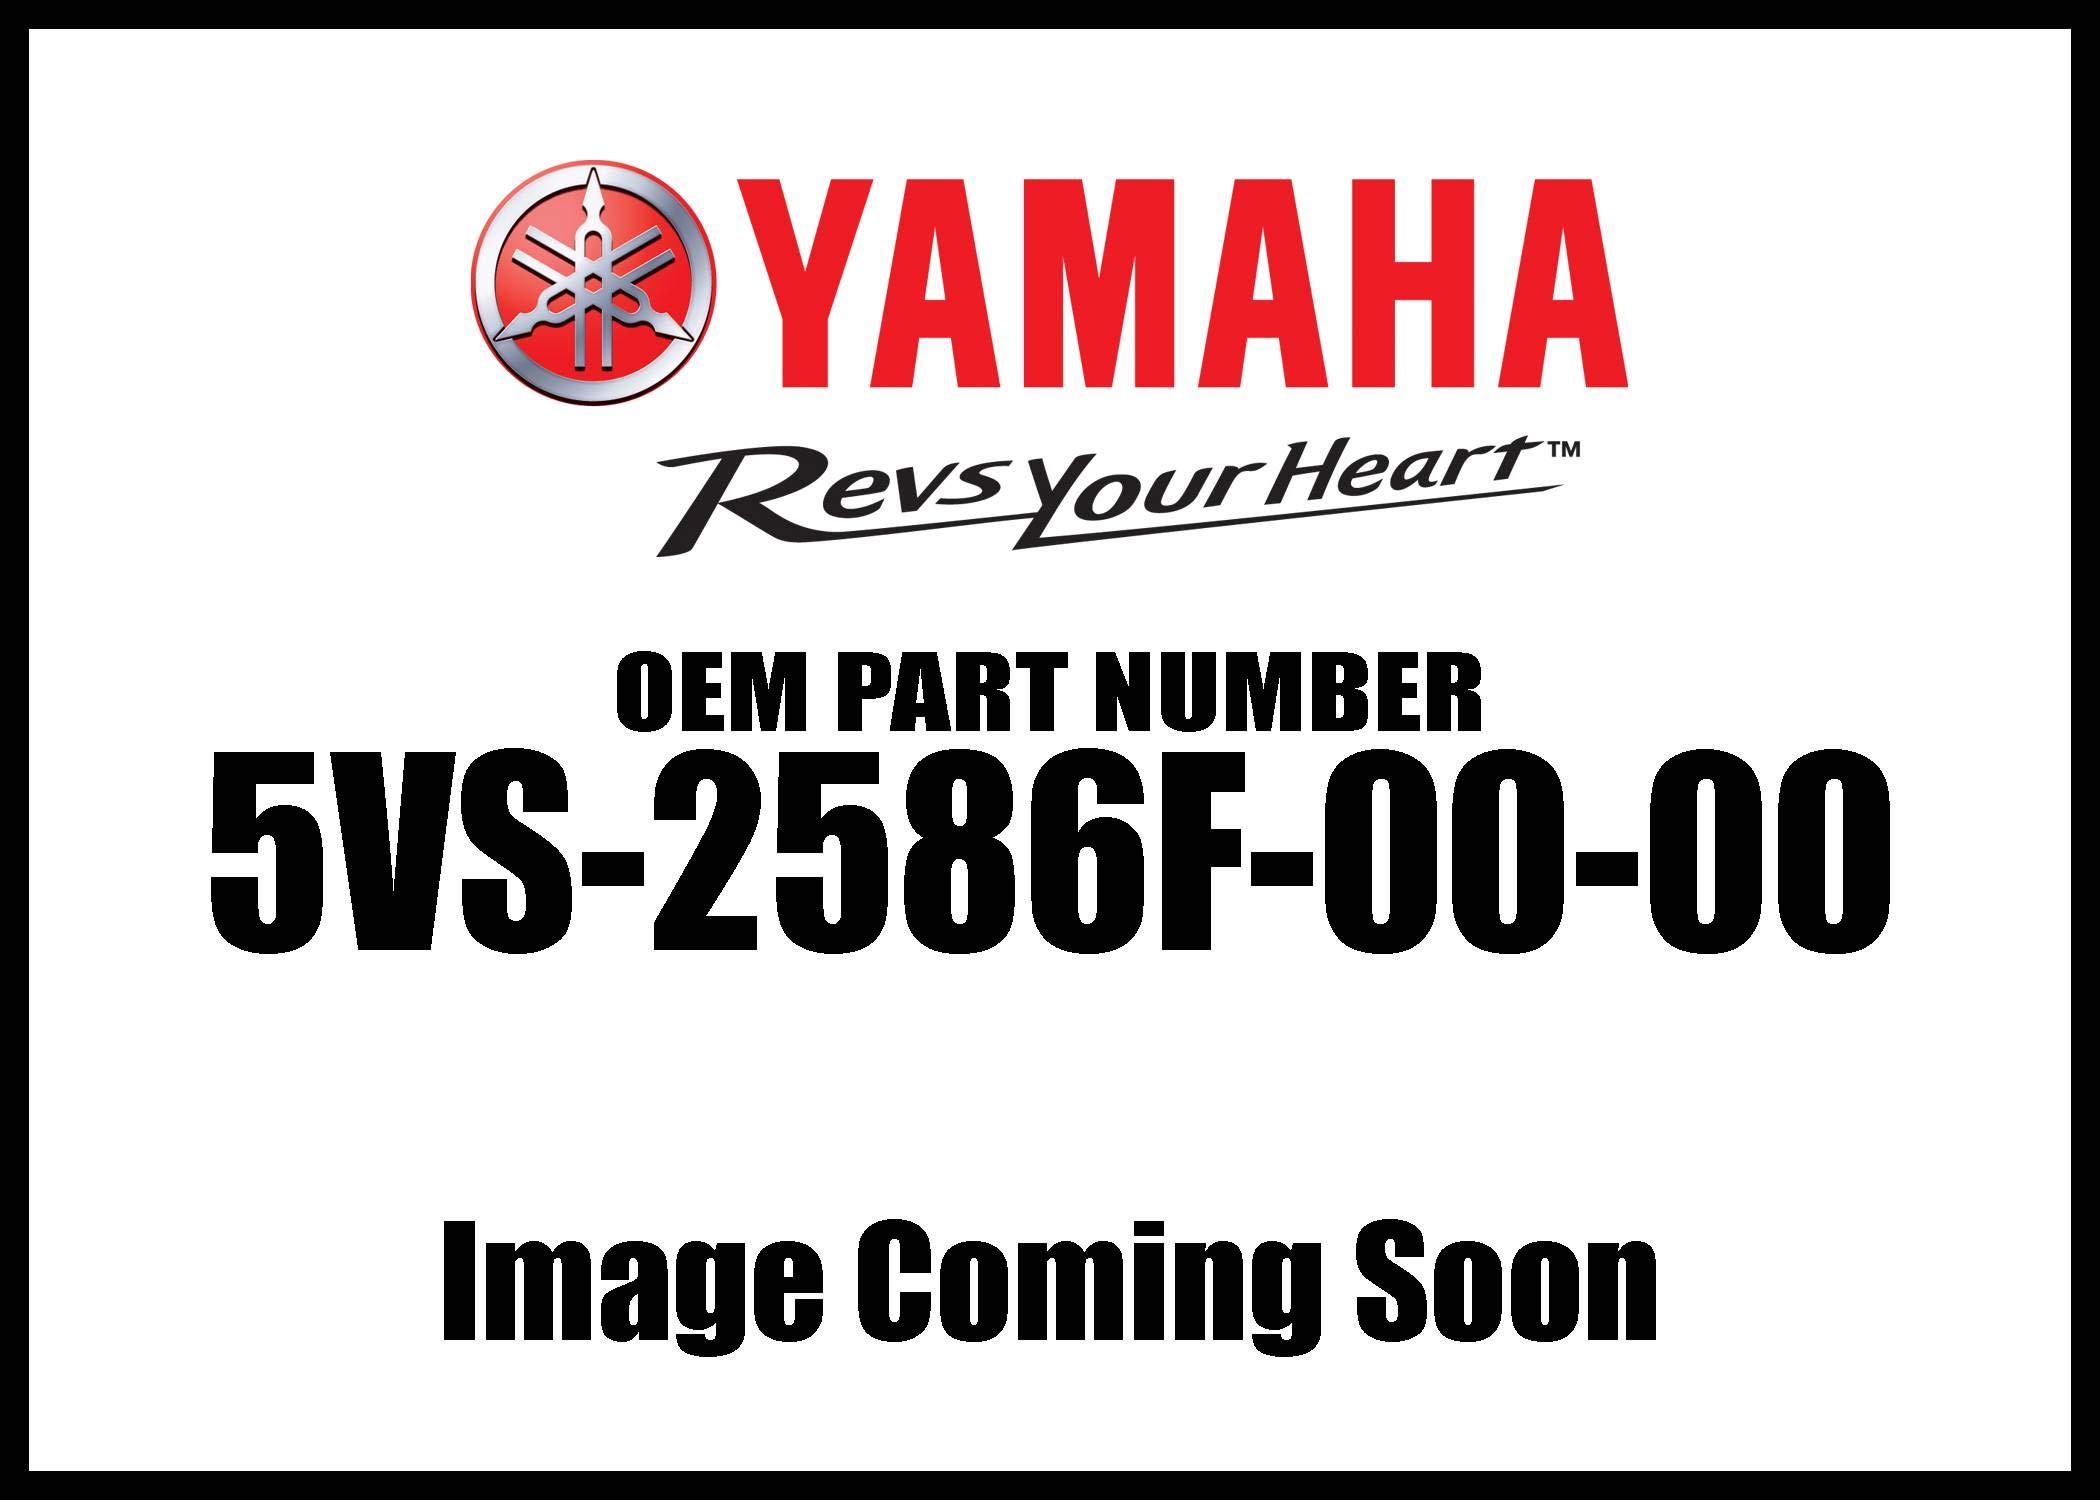 Yamaha 5VS-2586F-00-00; NUT, COVER; 5VS2586F0000